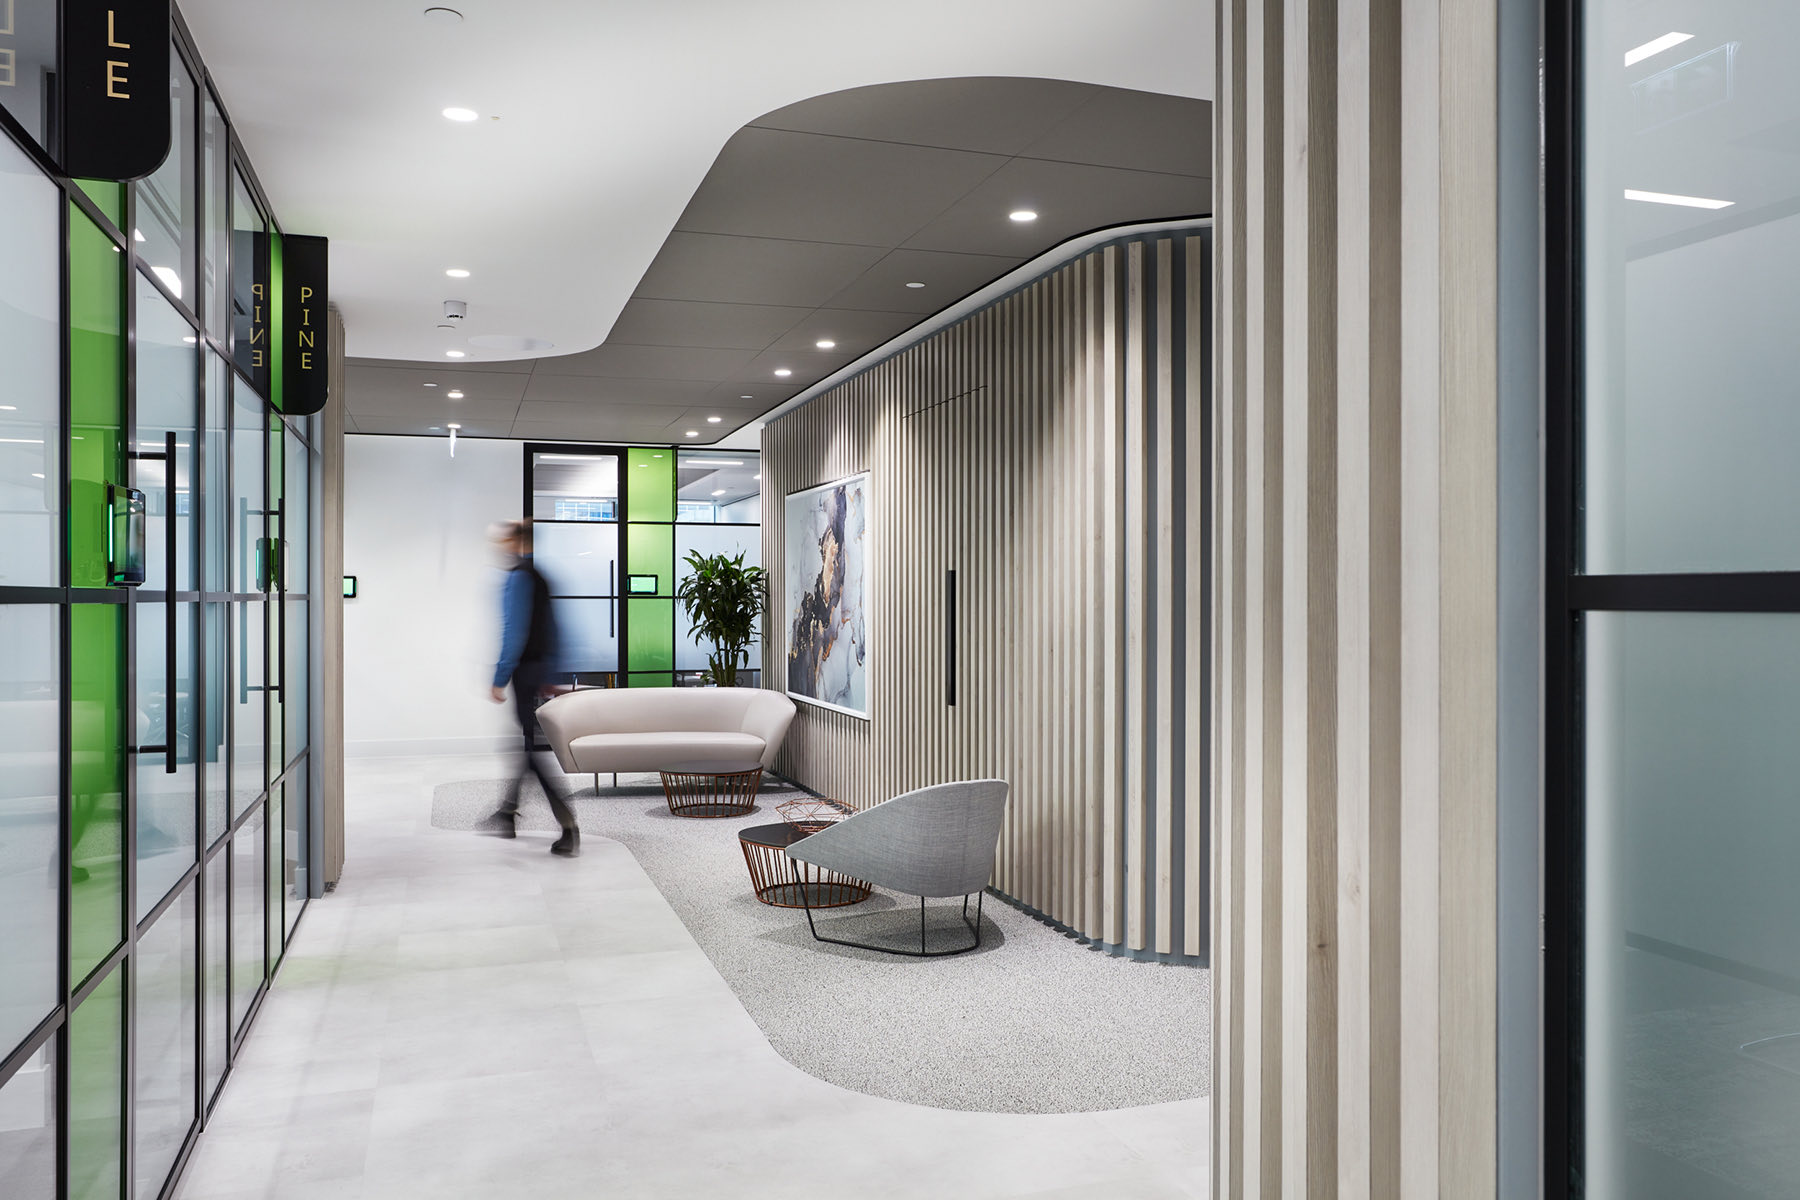 A Look Inside MHA MacIntyre Hudson's New London Office